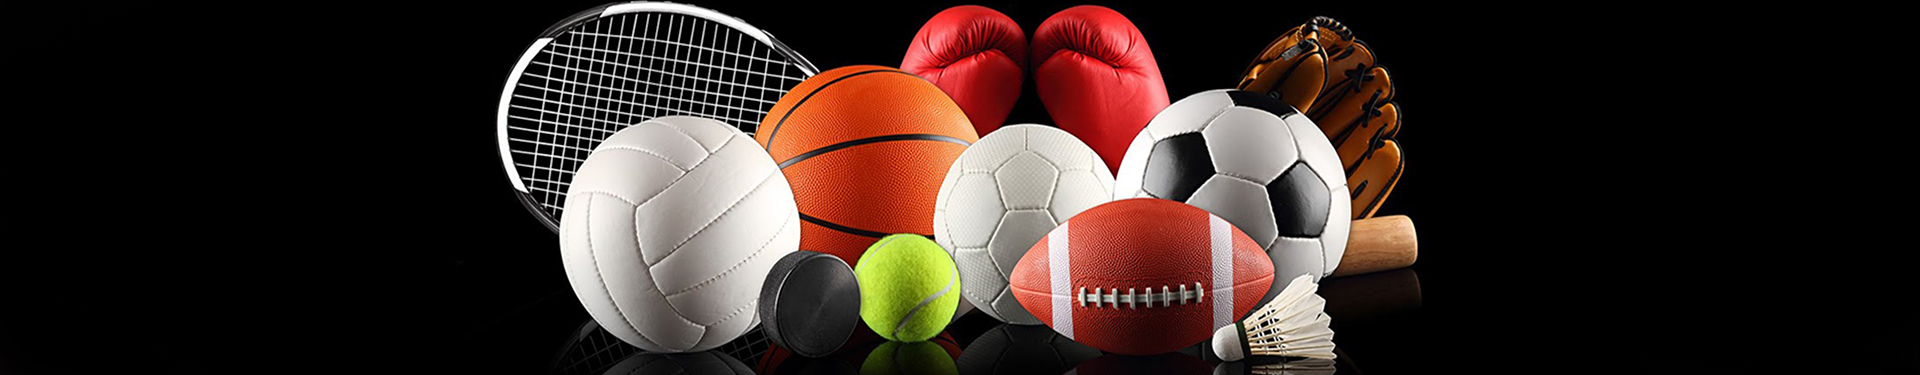 Palloni Campionati Europei